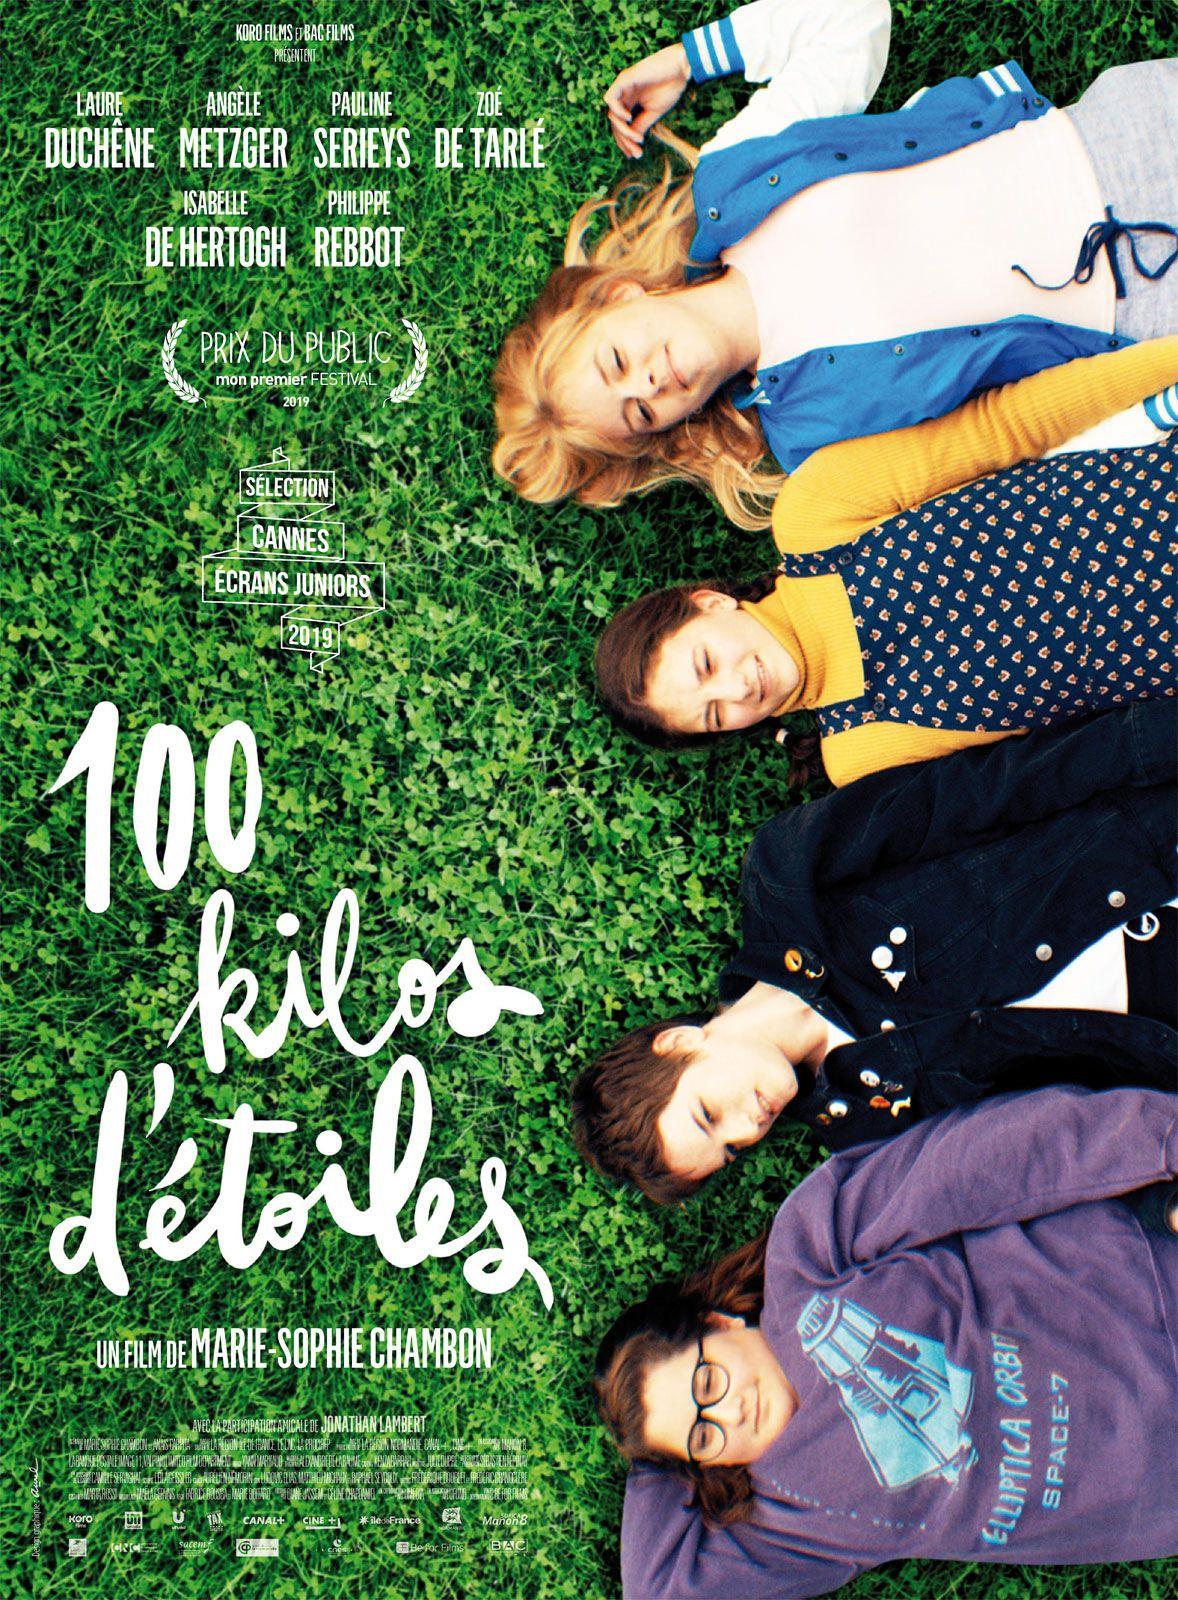 100 kilos d'étoiles - Film (2019)